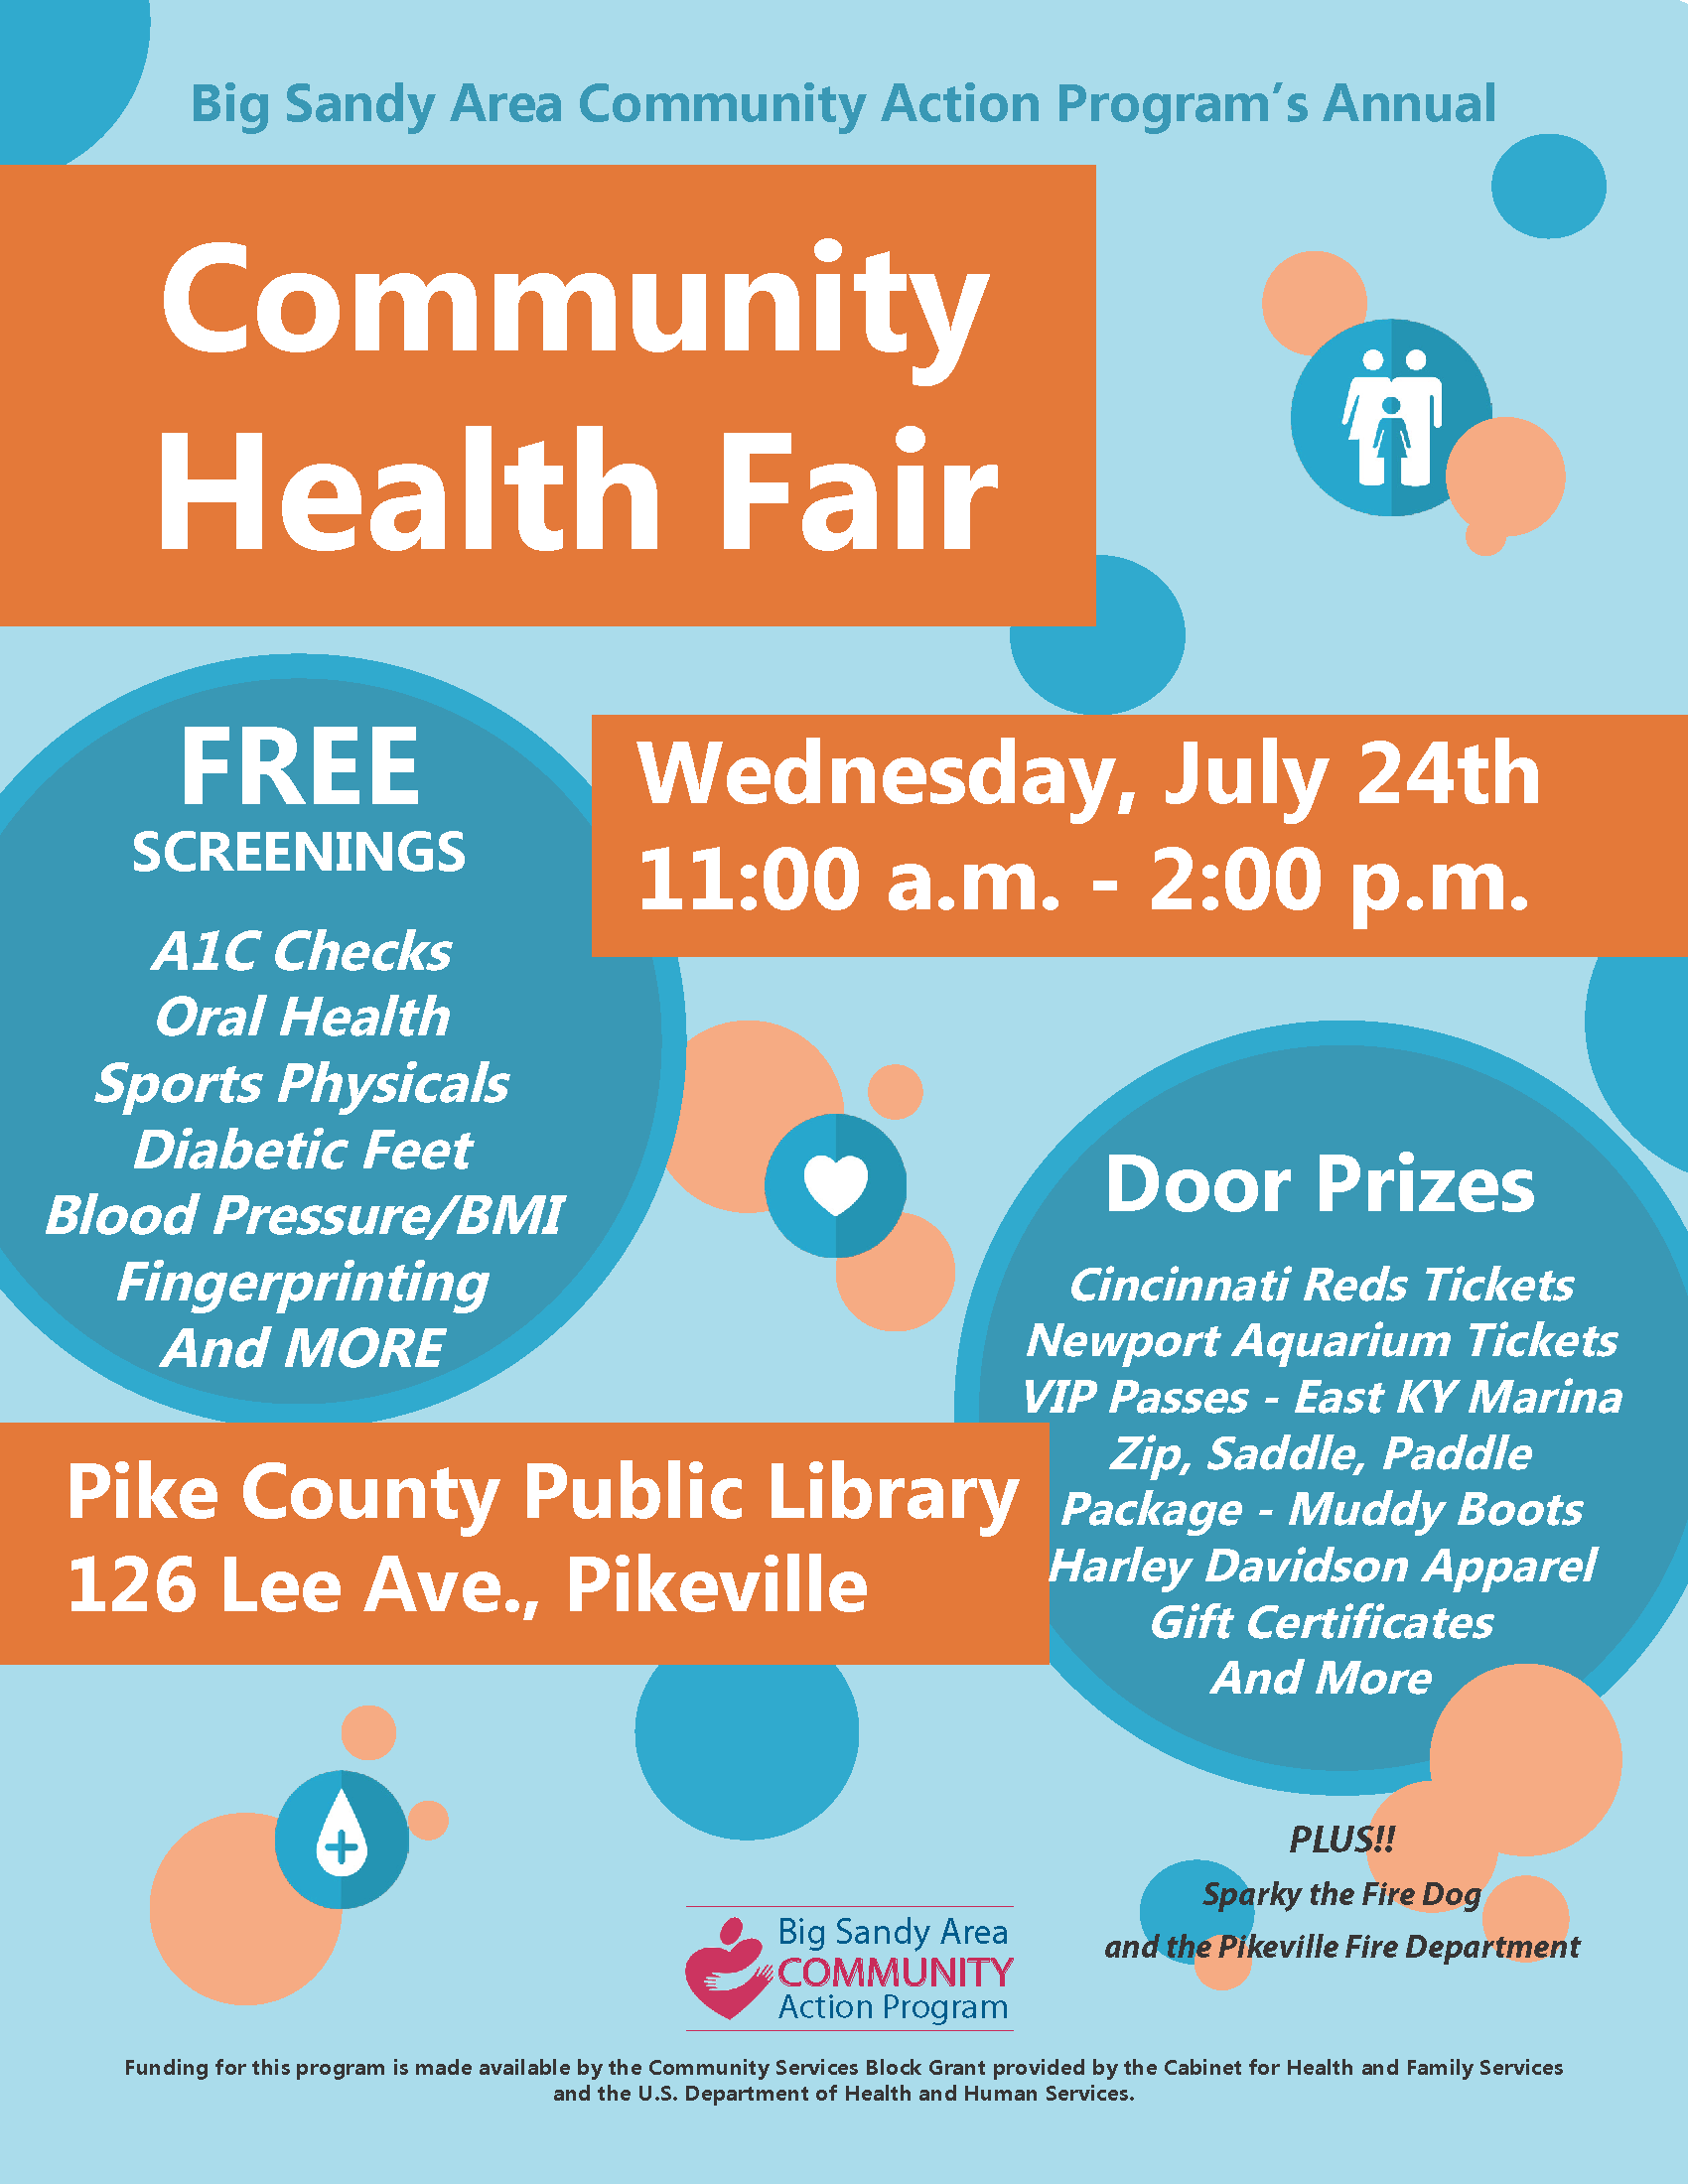 Health Fair Flyer 2019 - Pike.png